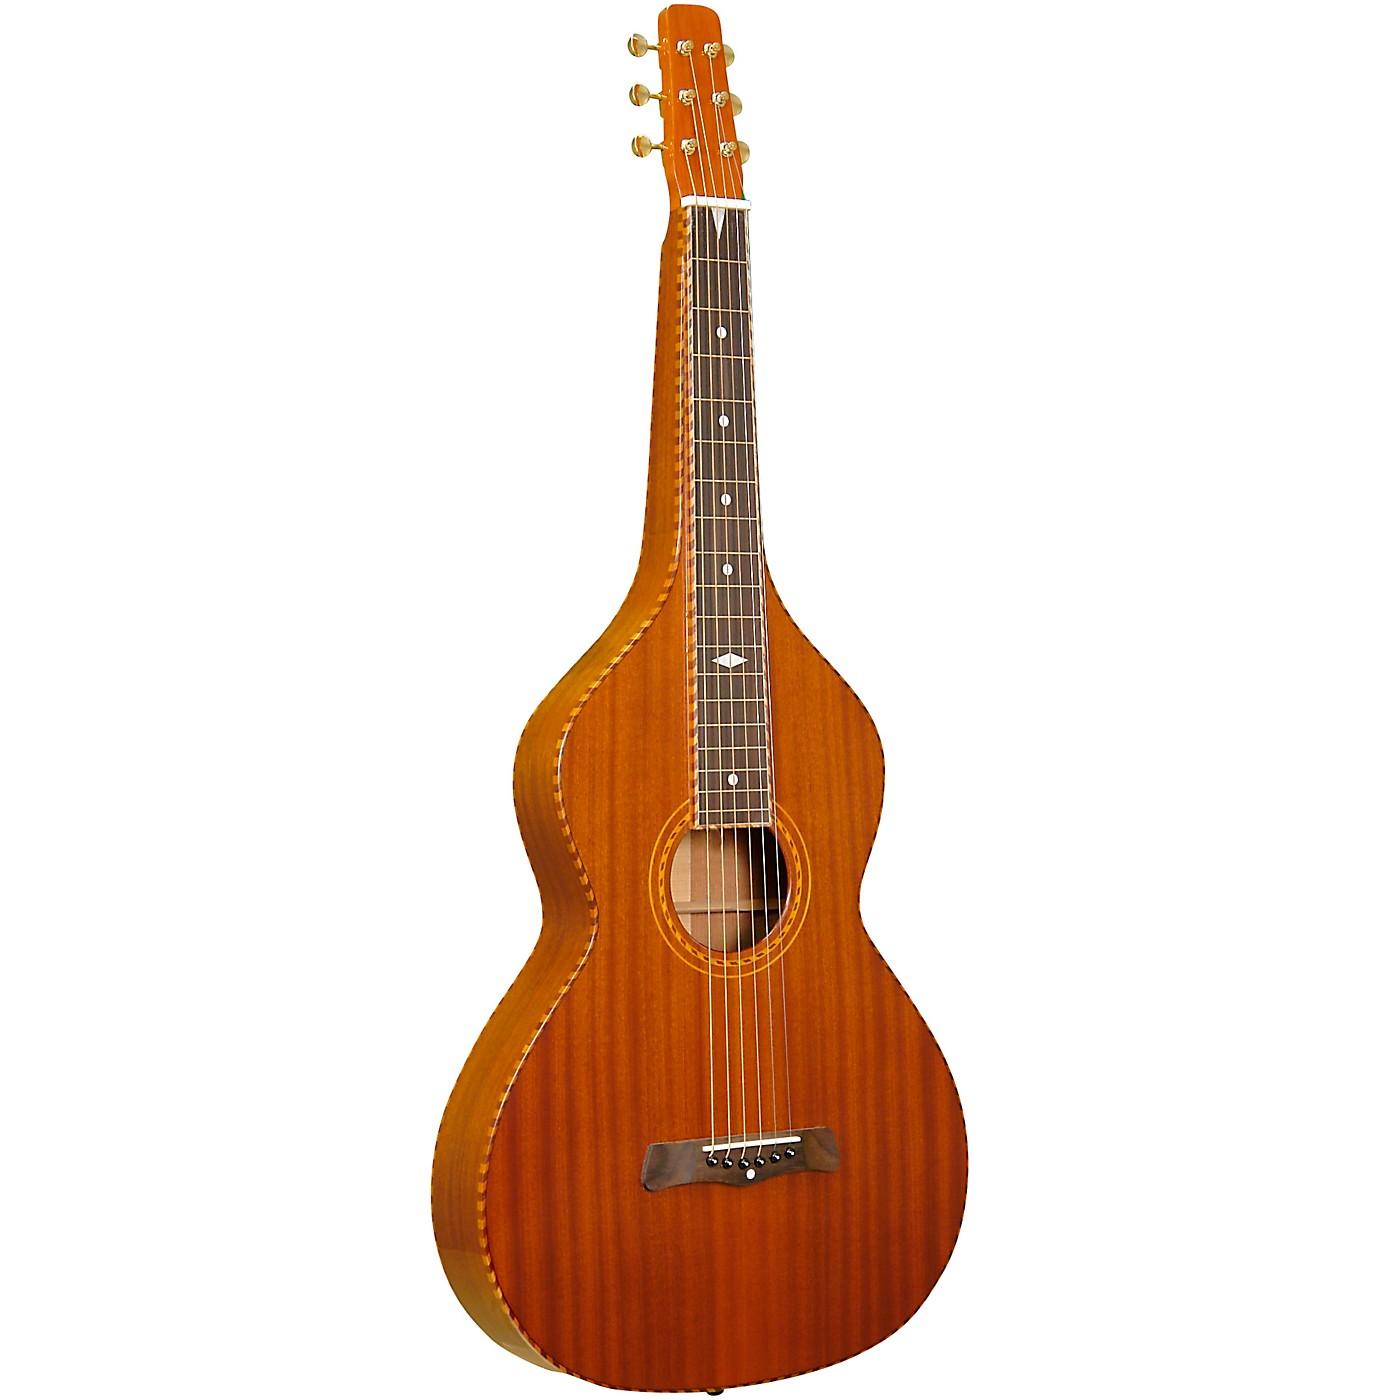 Gold Tone SM-Weissenborn Hawaiian-Style Left-Handed Slide Guitar thumbnail